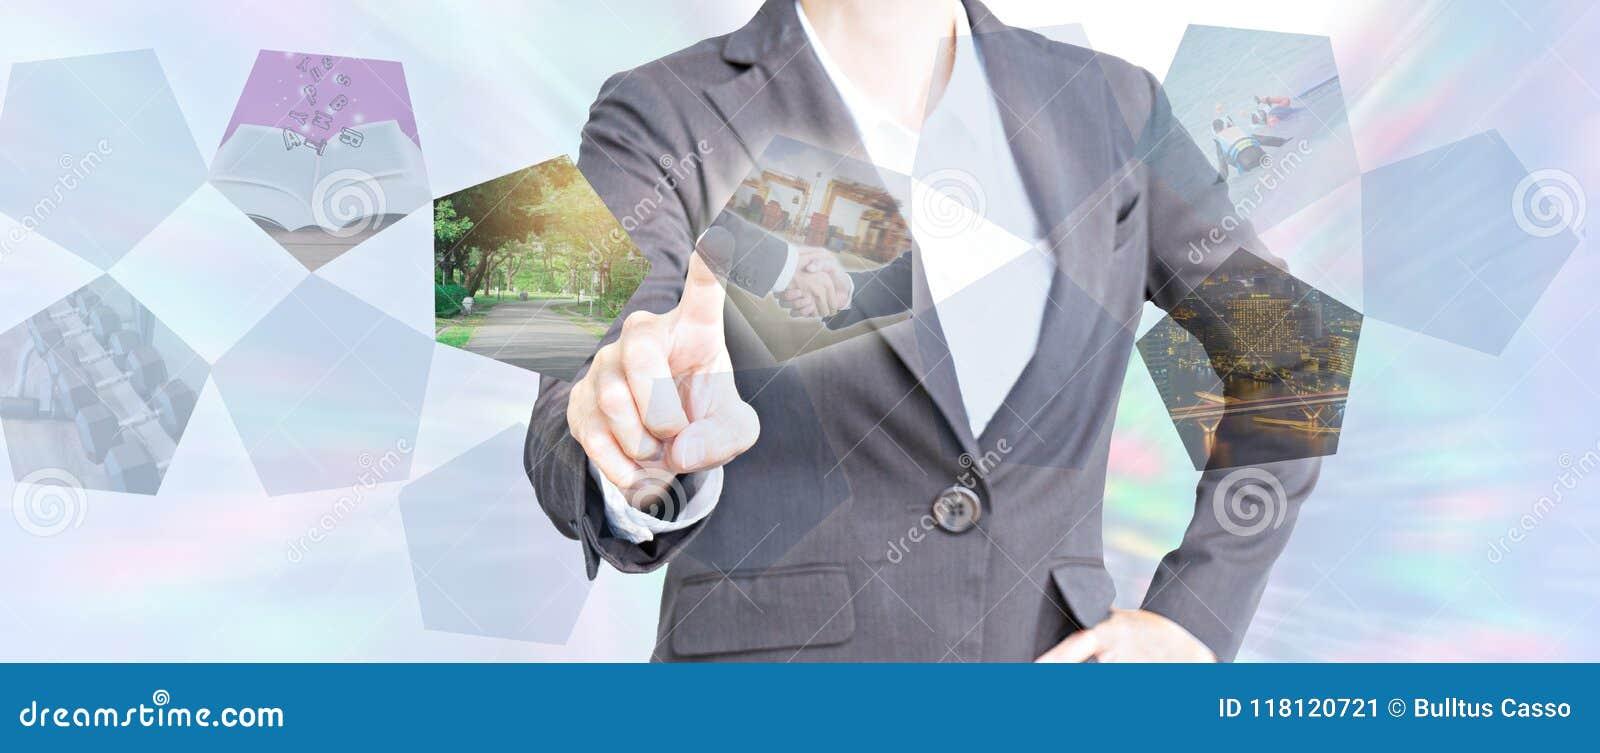 Bedrijfsmensen wat betreft het virtuele scherm over zaken